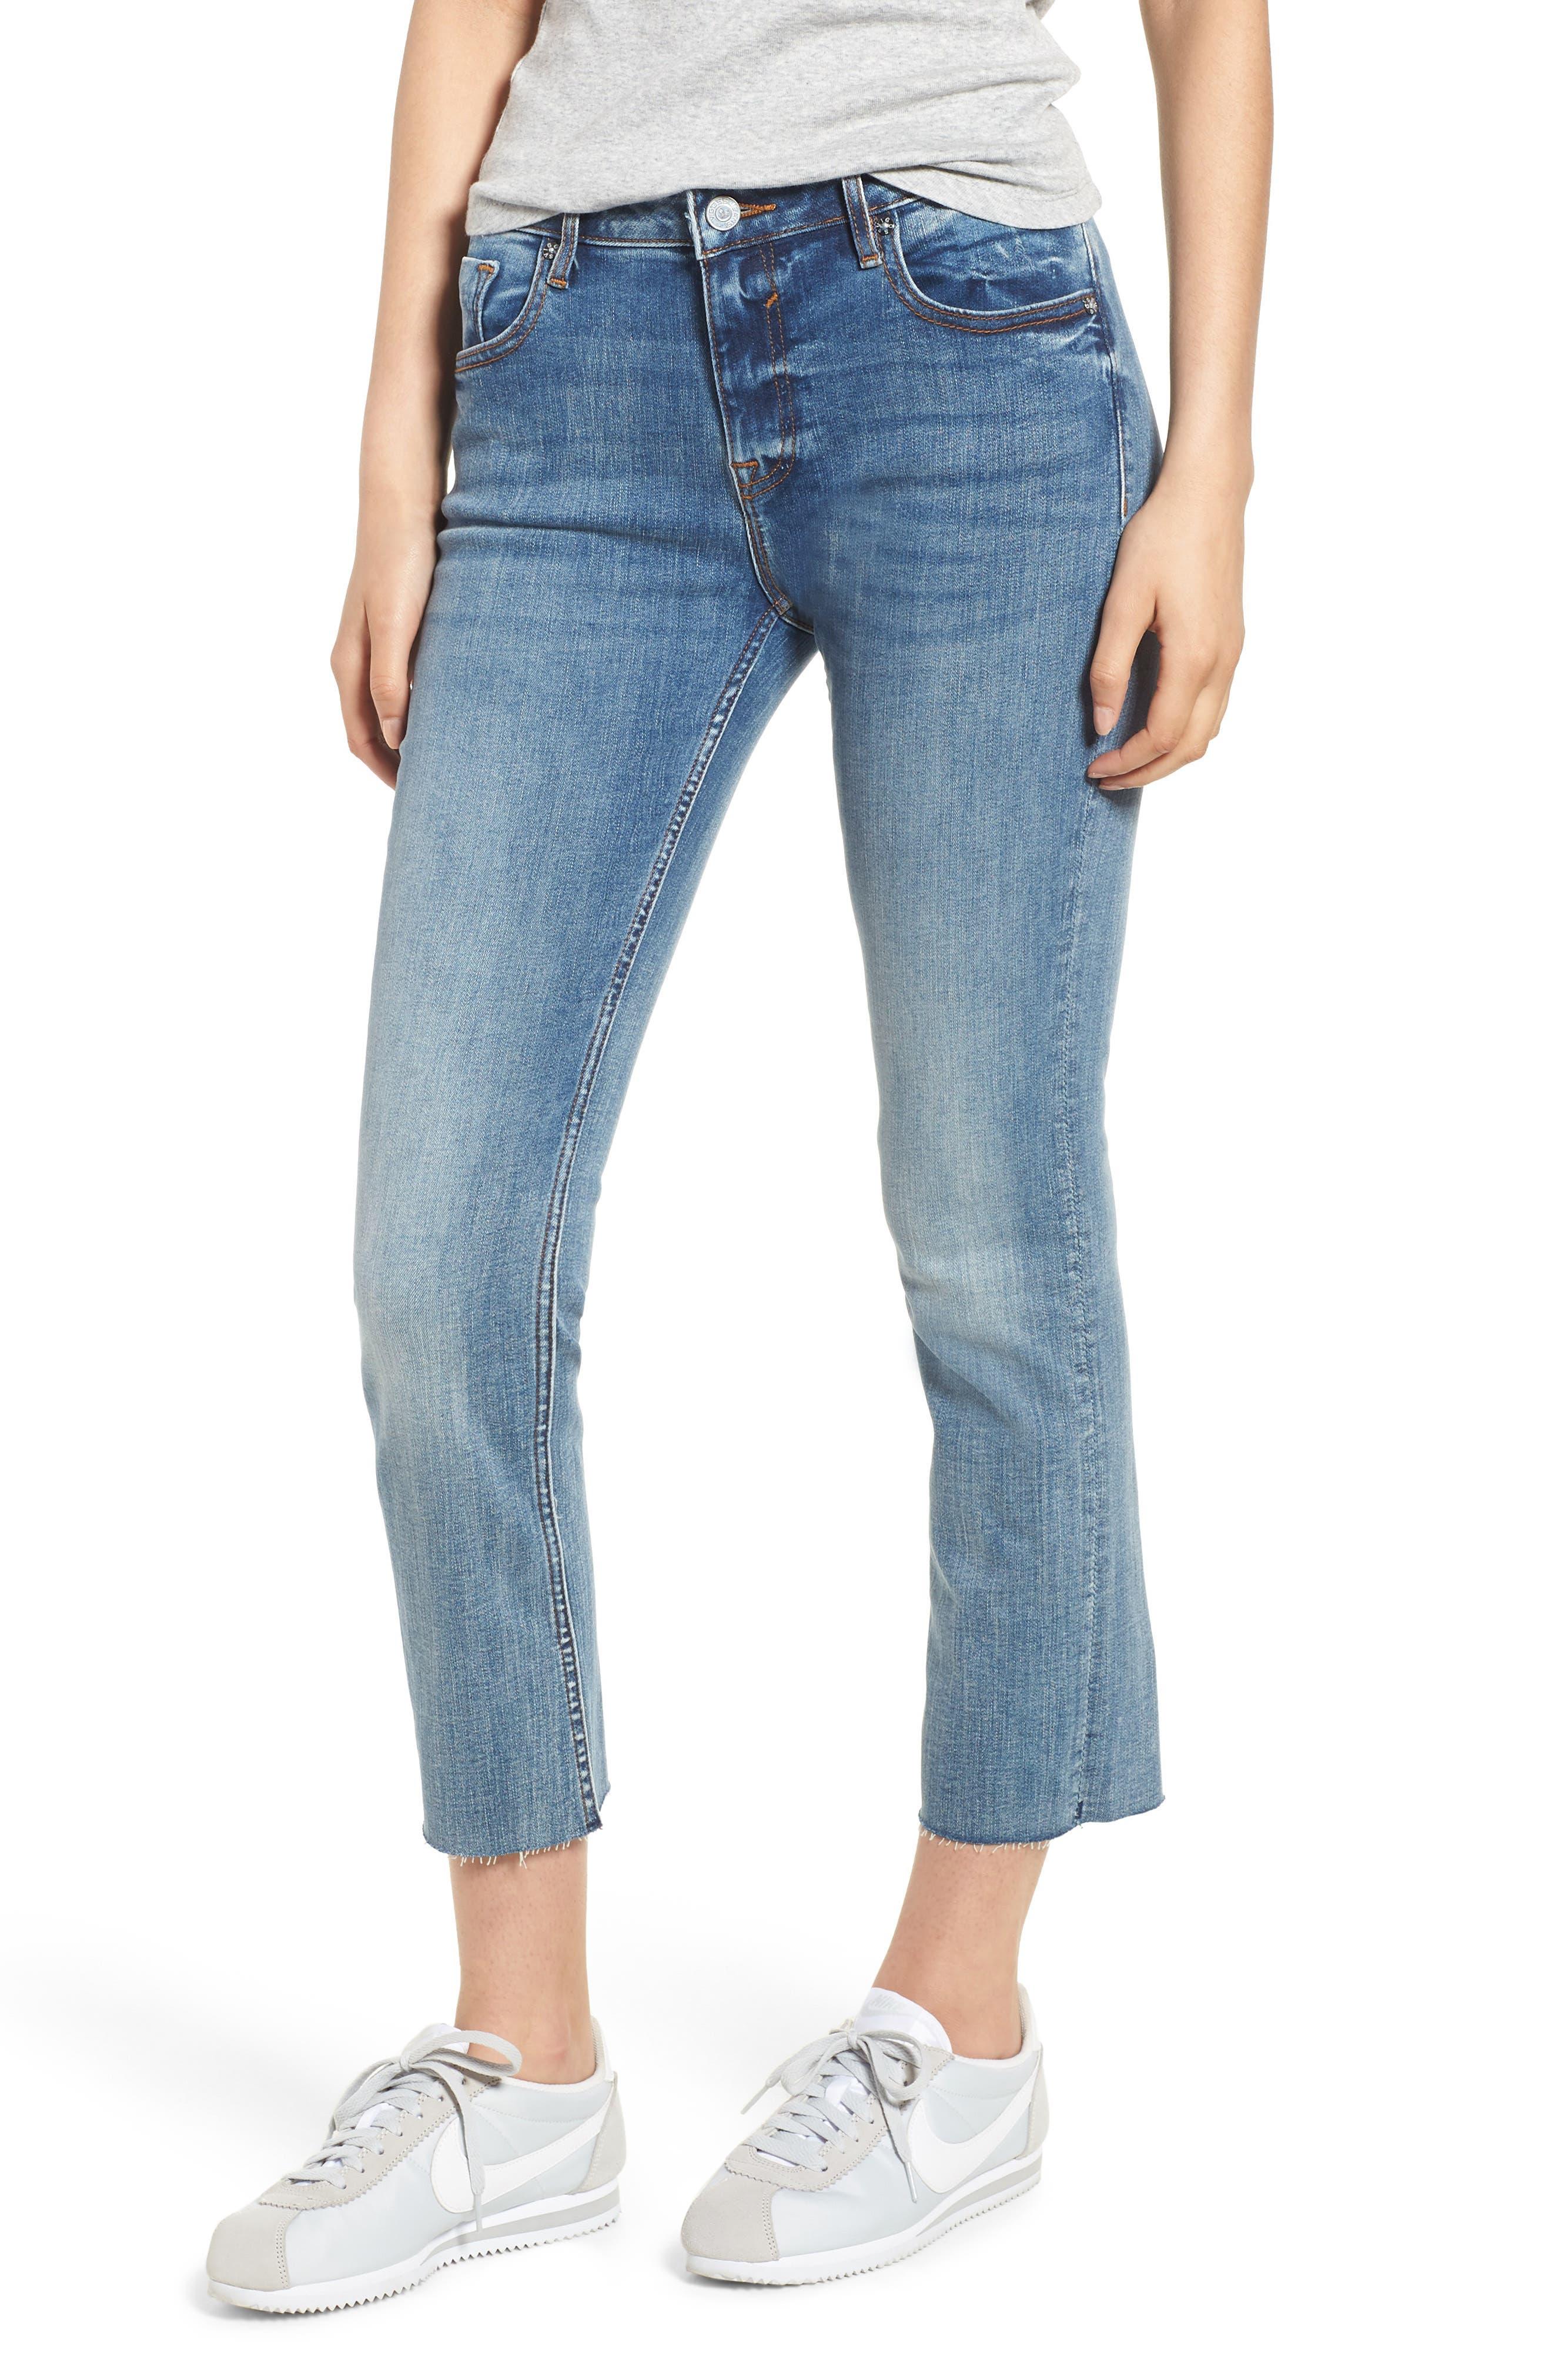 Jagger Crop Straight Leg Jeans,                             Main thumbnail 1, color,                             400